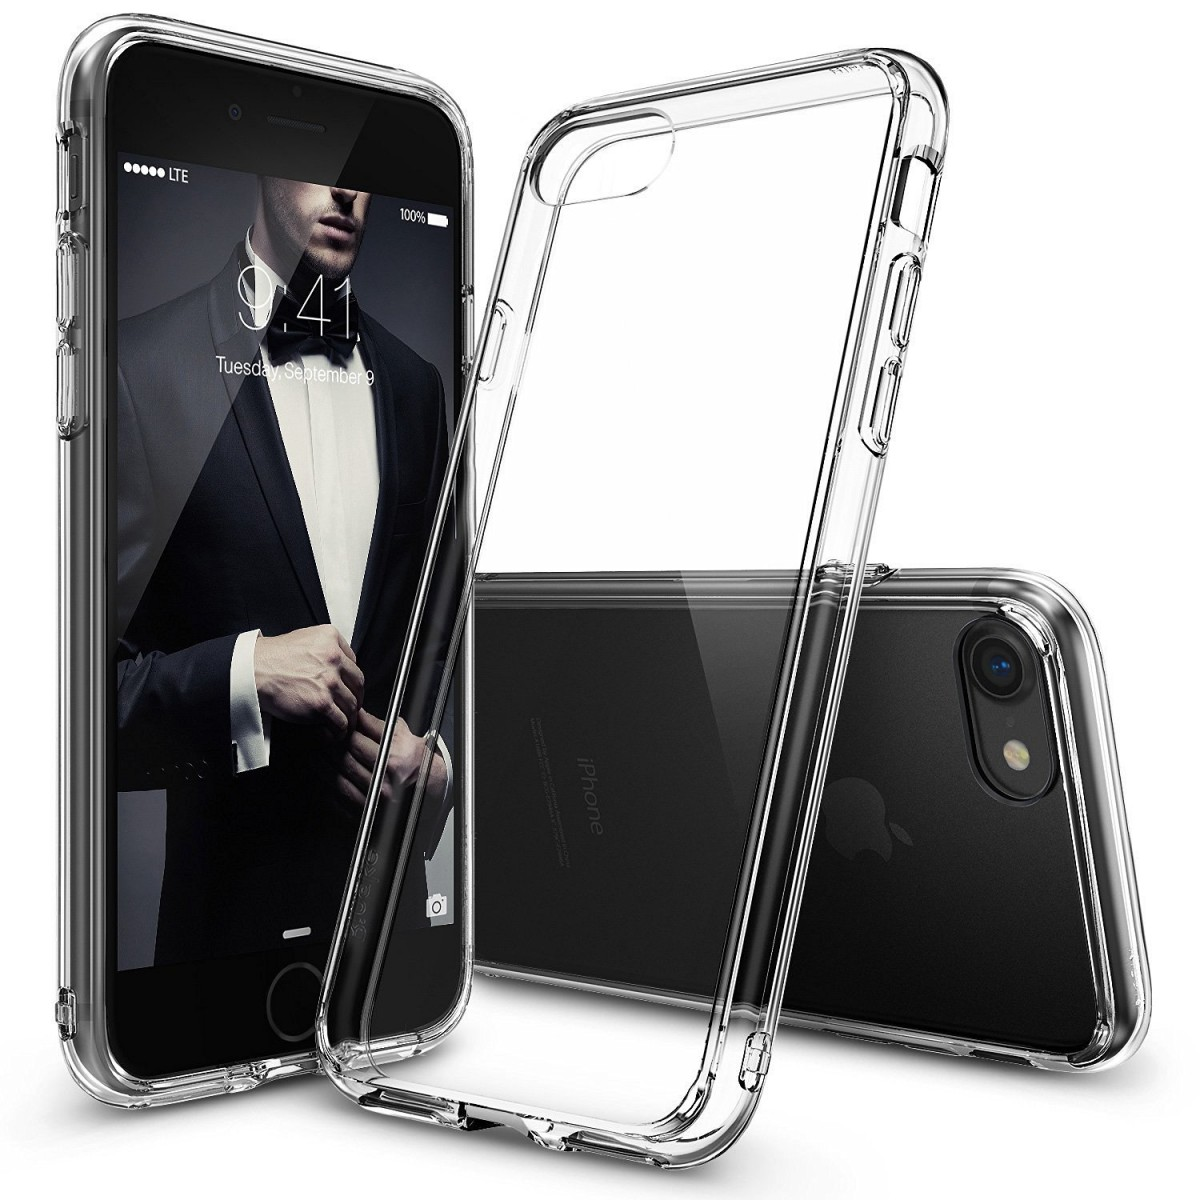 Průhledný čirý obal   kryt Ultra Slim Hybrid na iPhone 8 7  ba5c51cd501